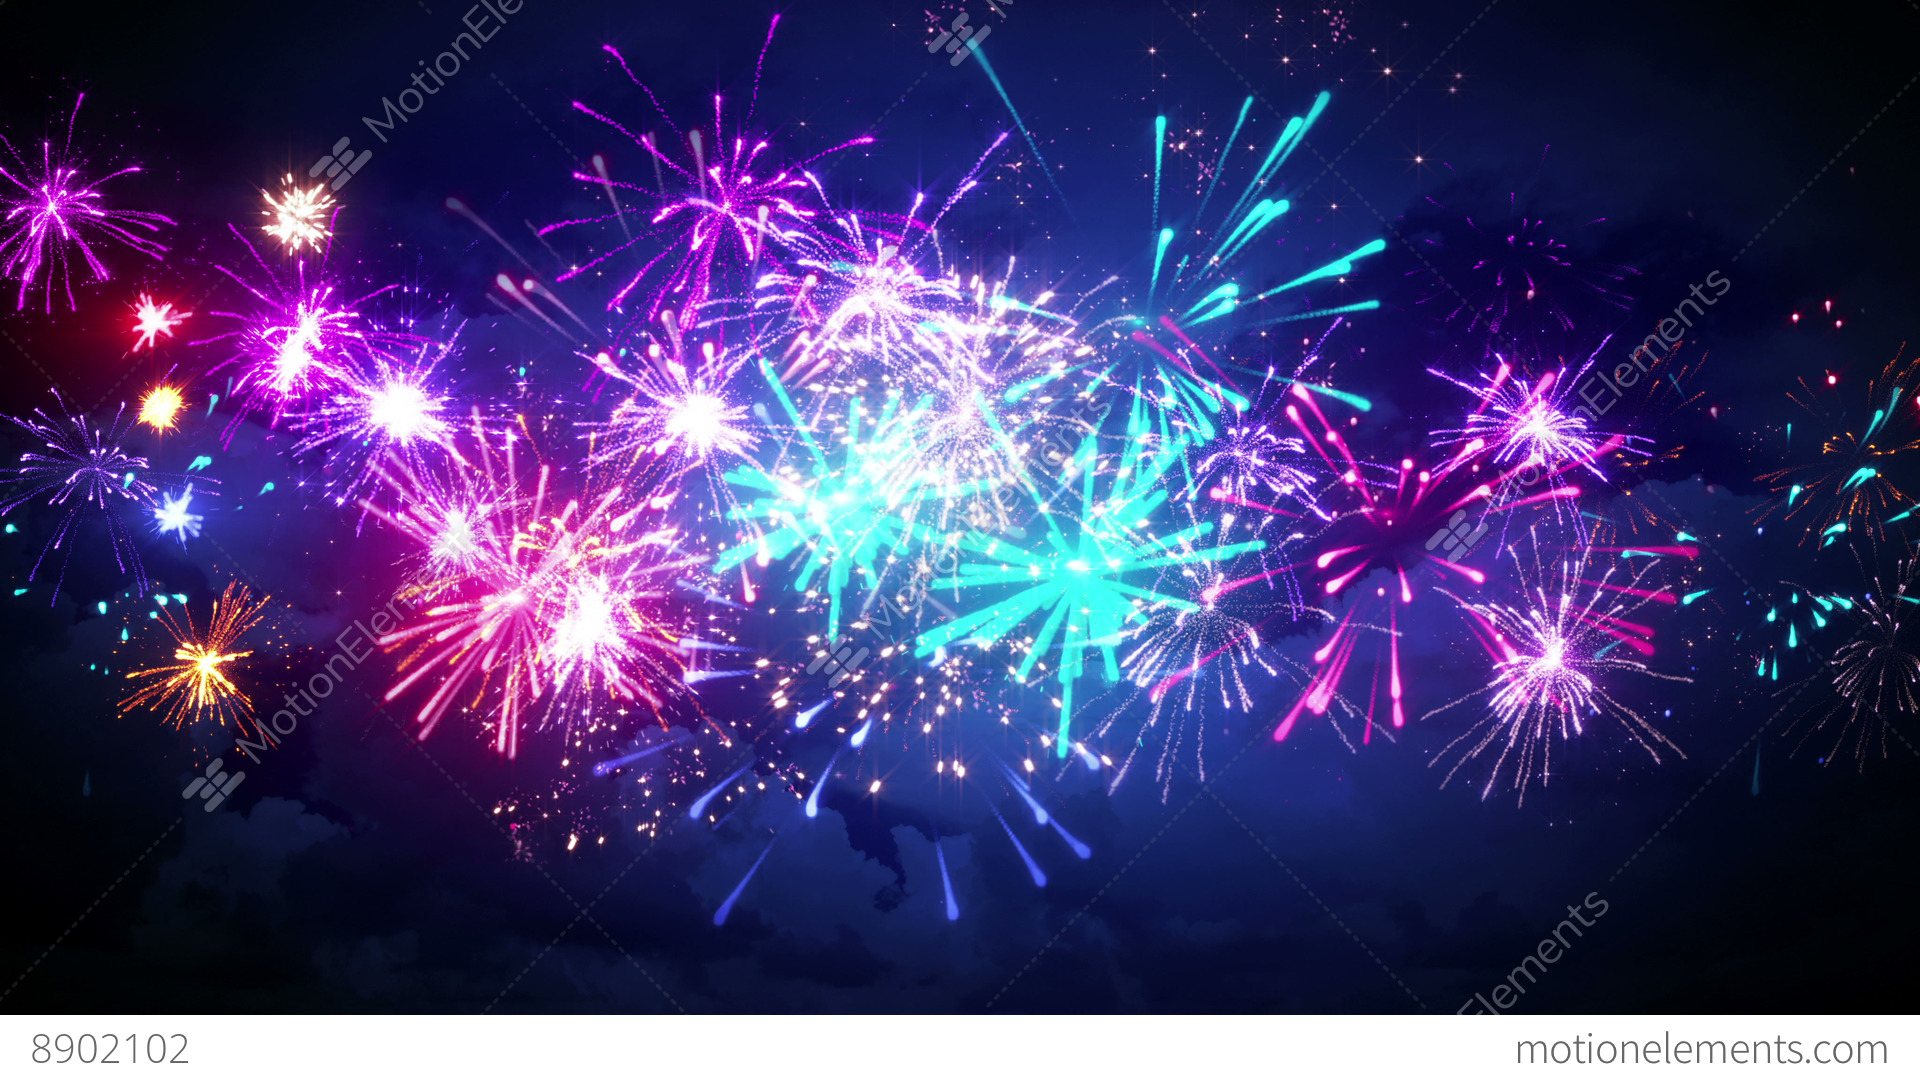 Flash Animated Fireworks